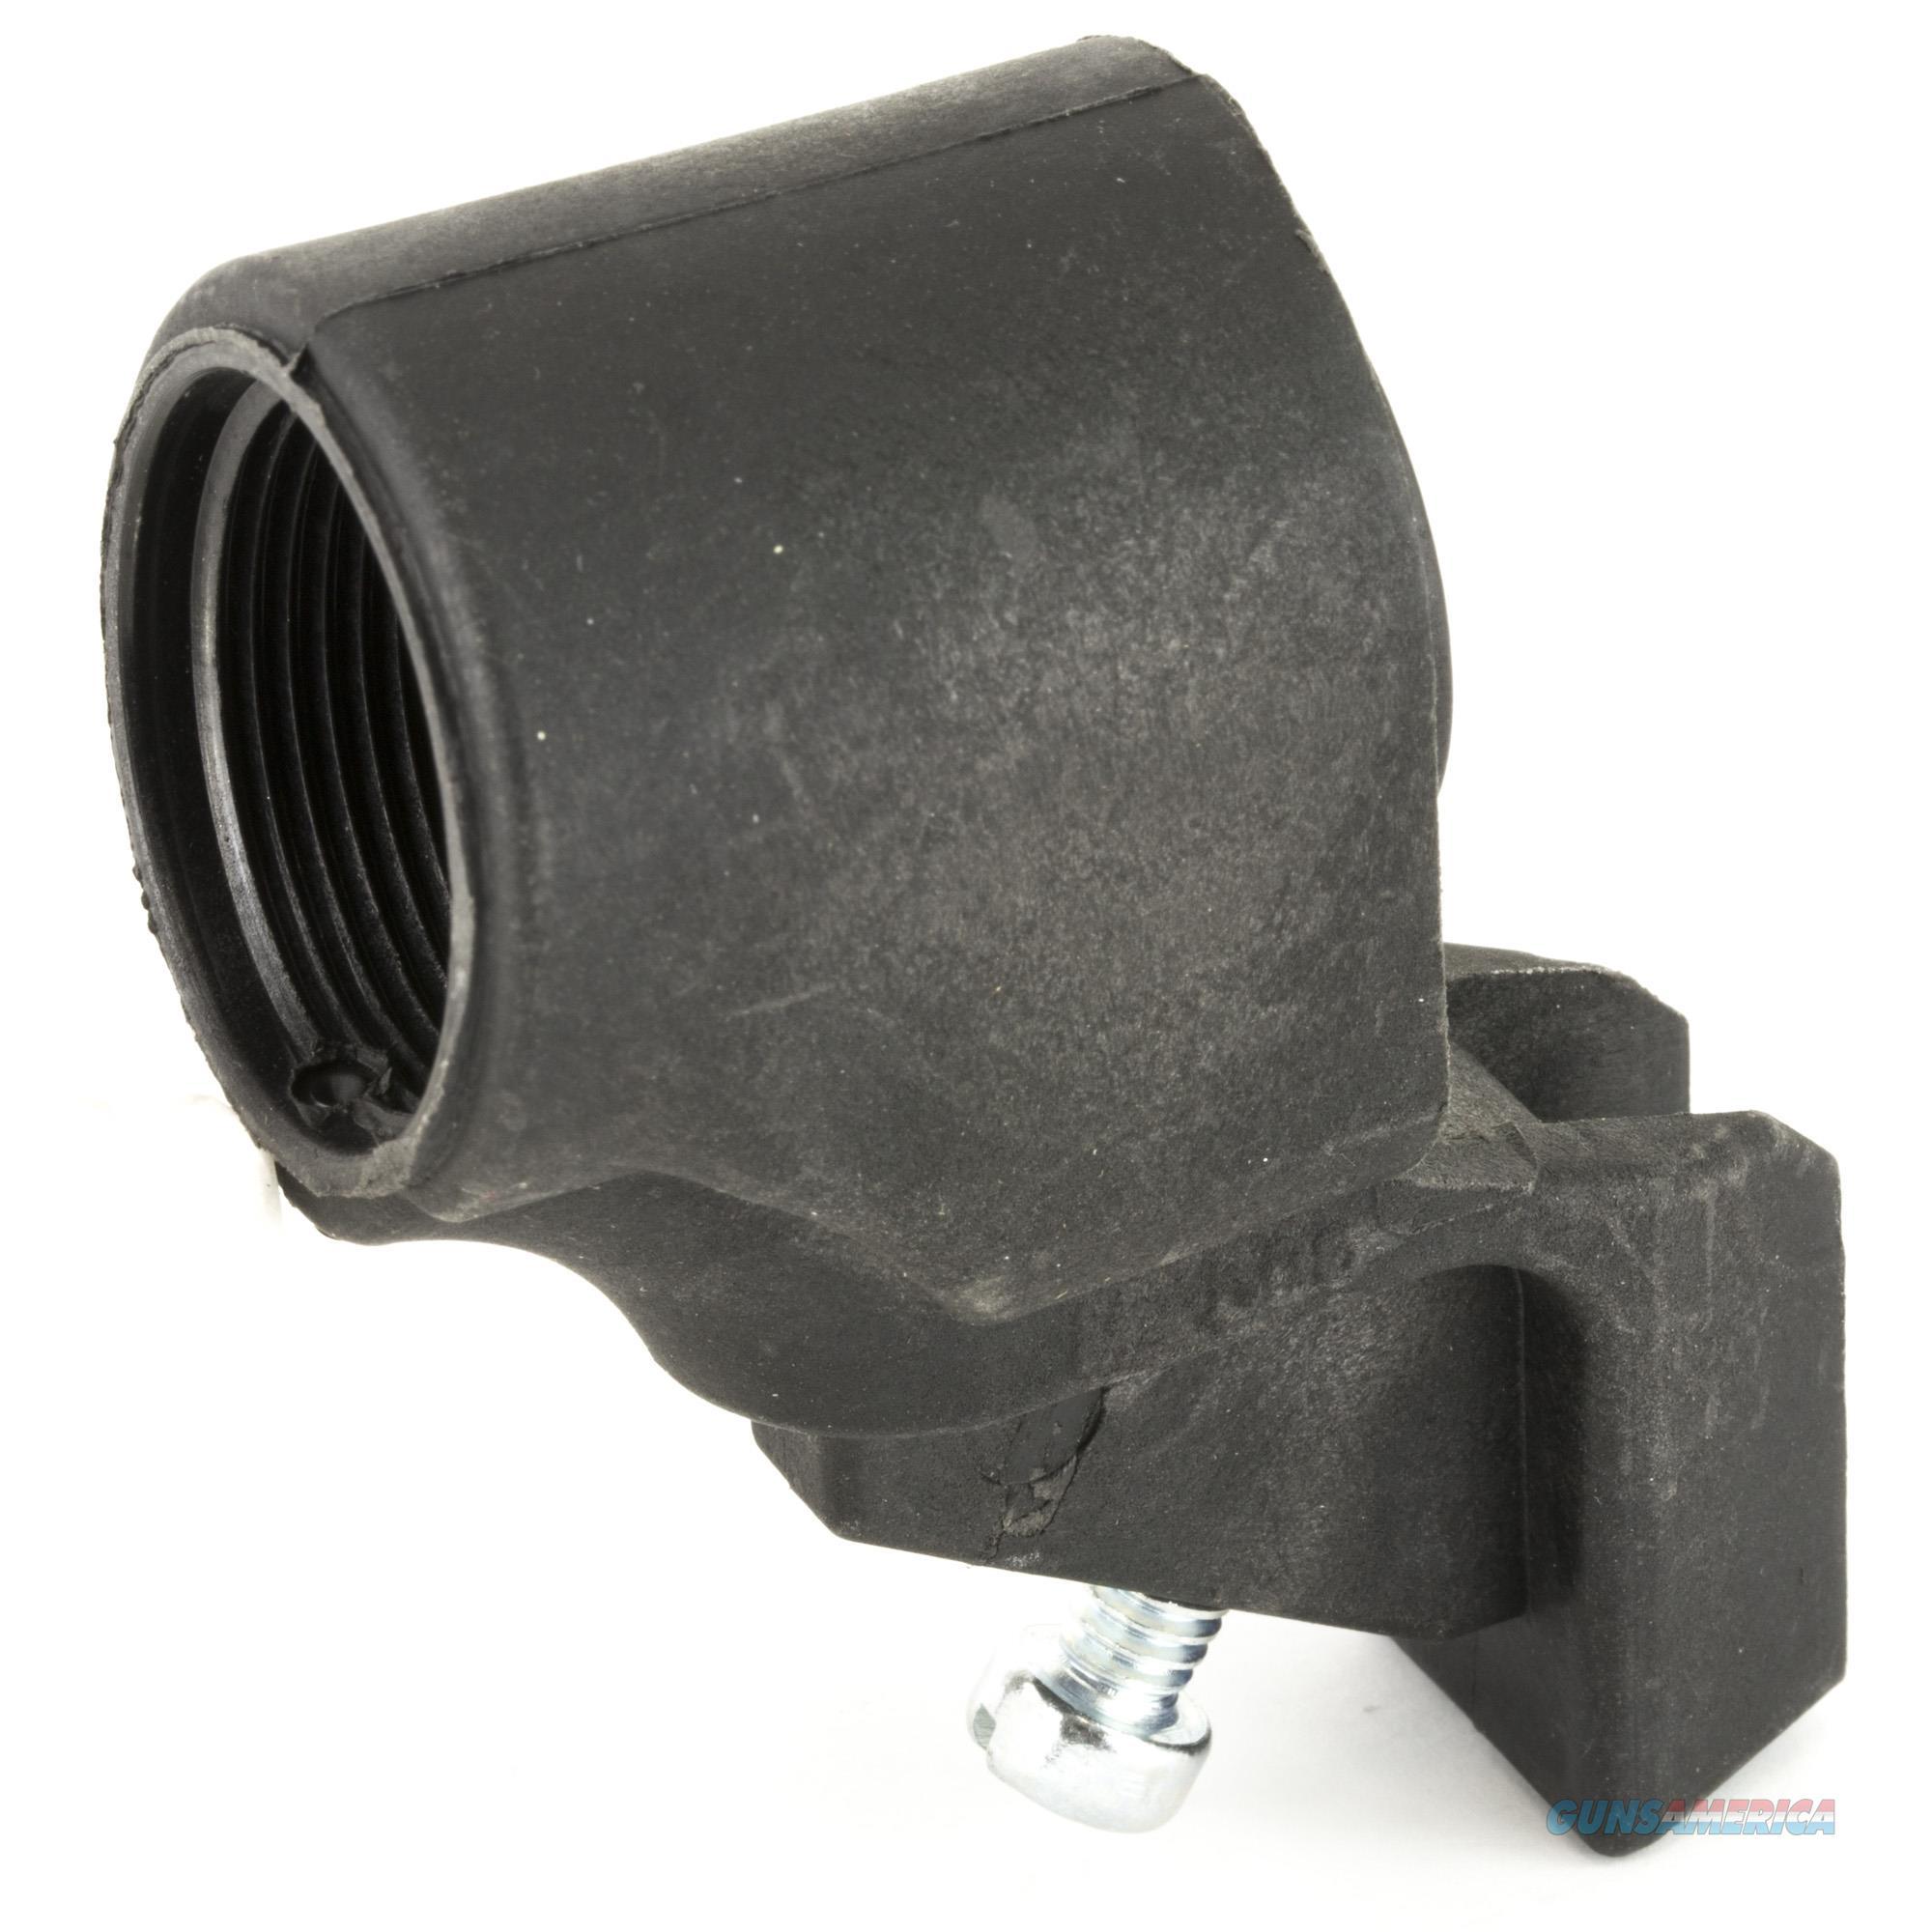 Ergo Grip Tactical Stock Adapter Fits Mossberg 500, 590 Black Finish 4454  Non-Guns > Gun Parts > Shotgun High Grade